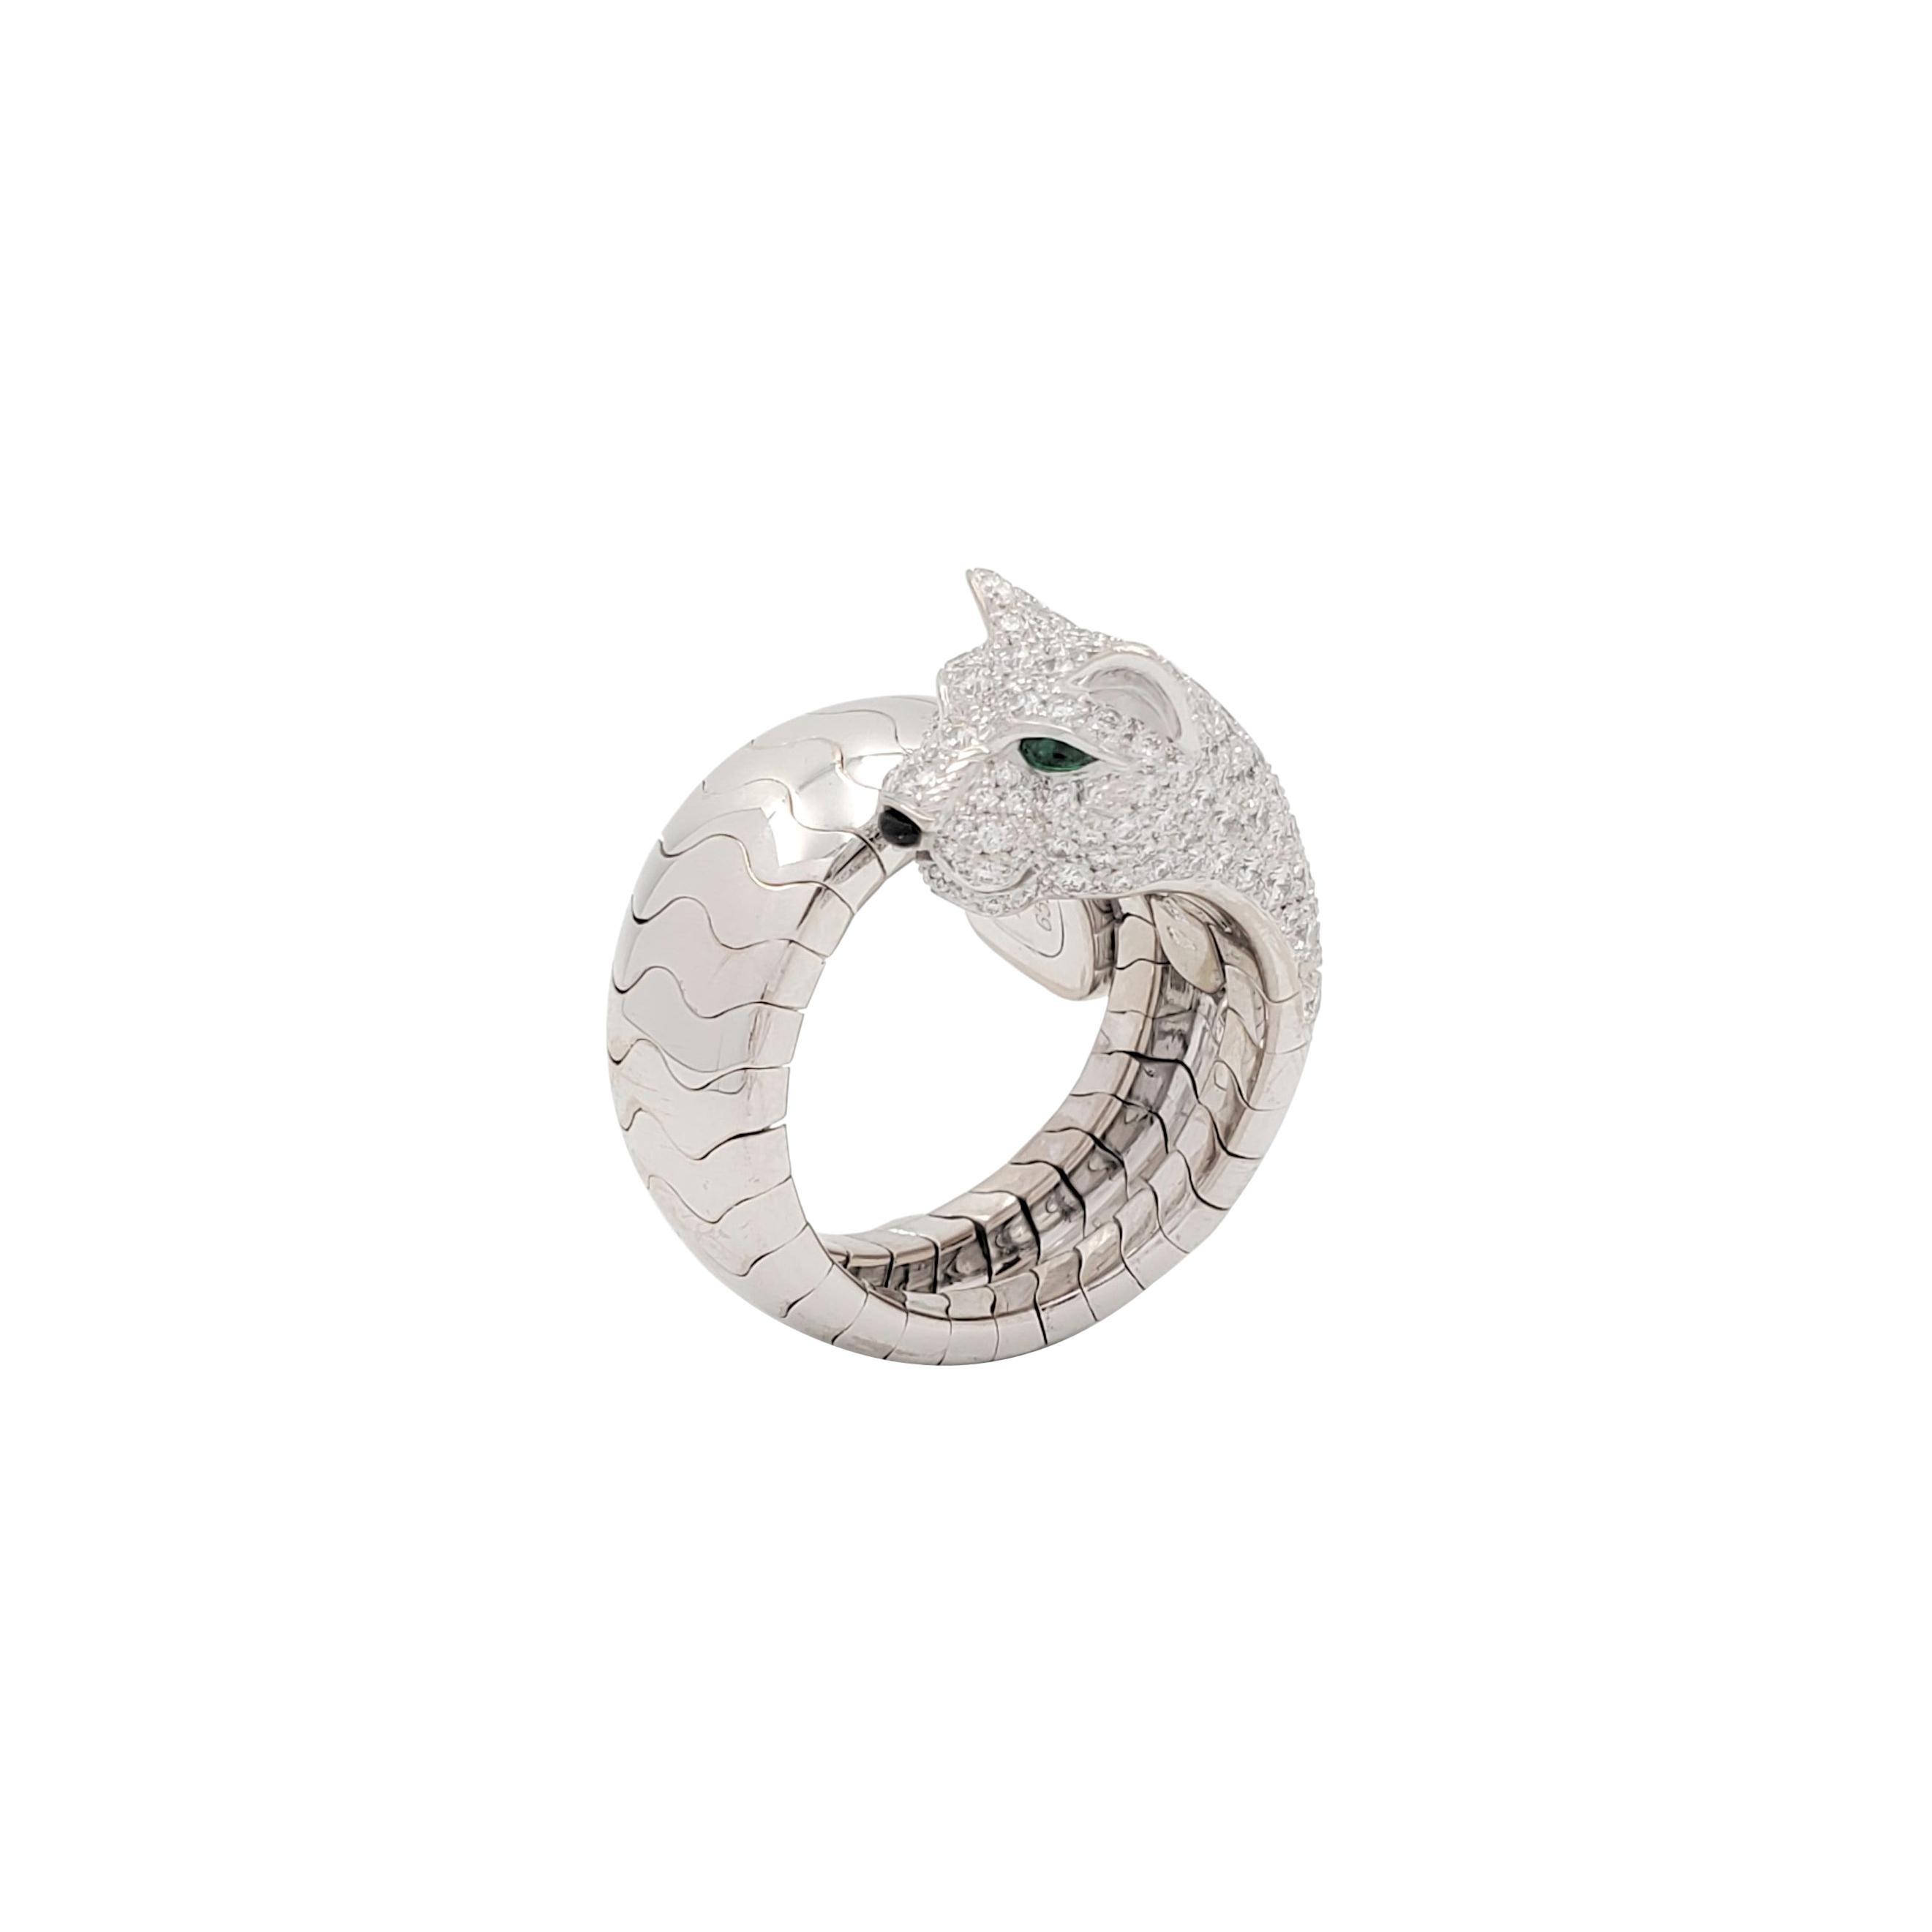 Cartier Panthère de Cartier White Gold Diamond Emerald and Onyx Ring